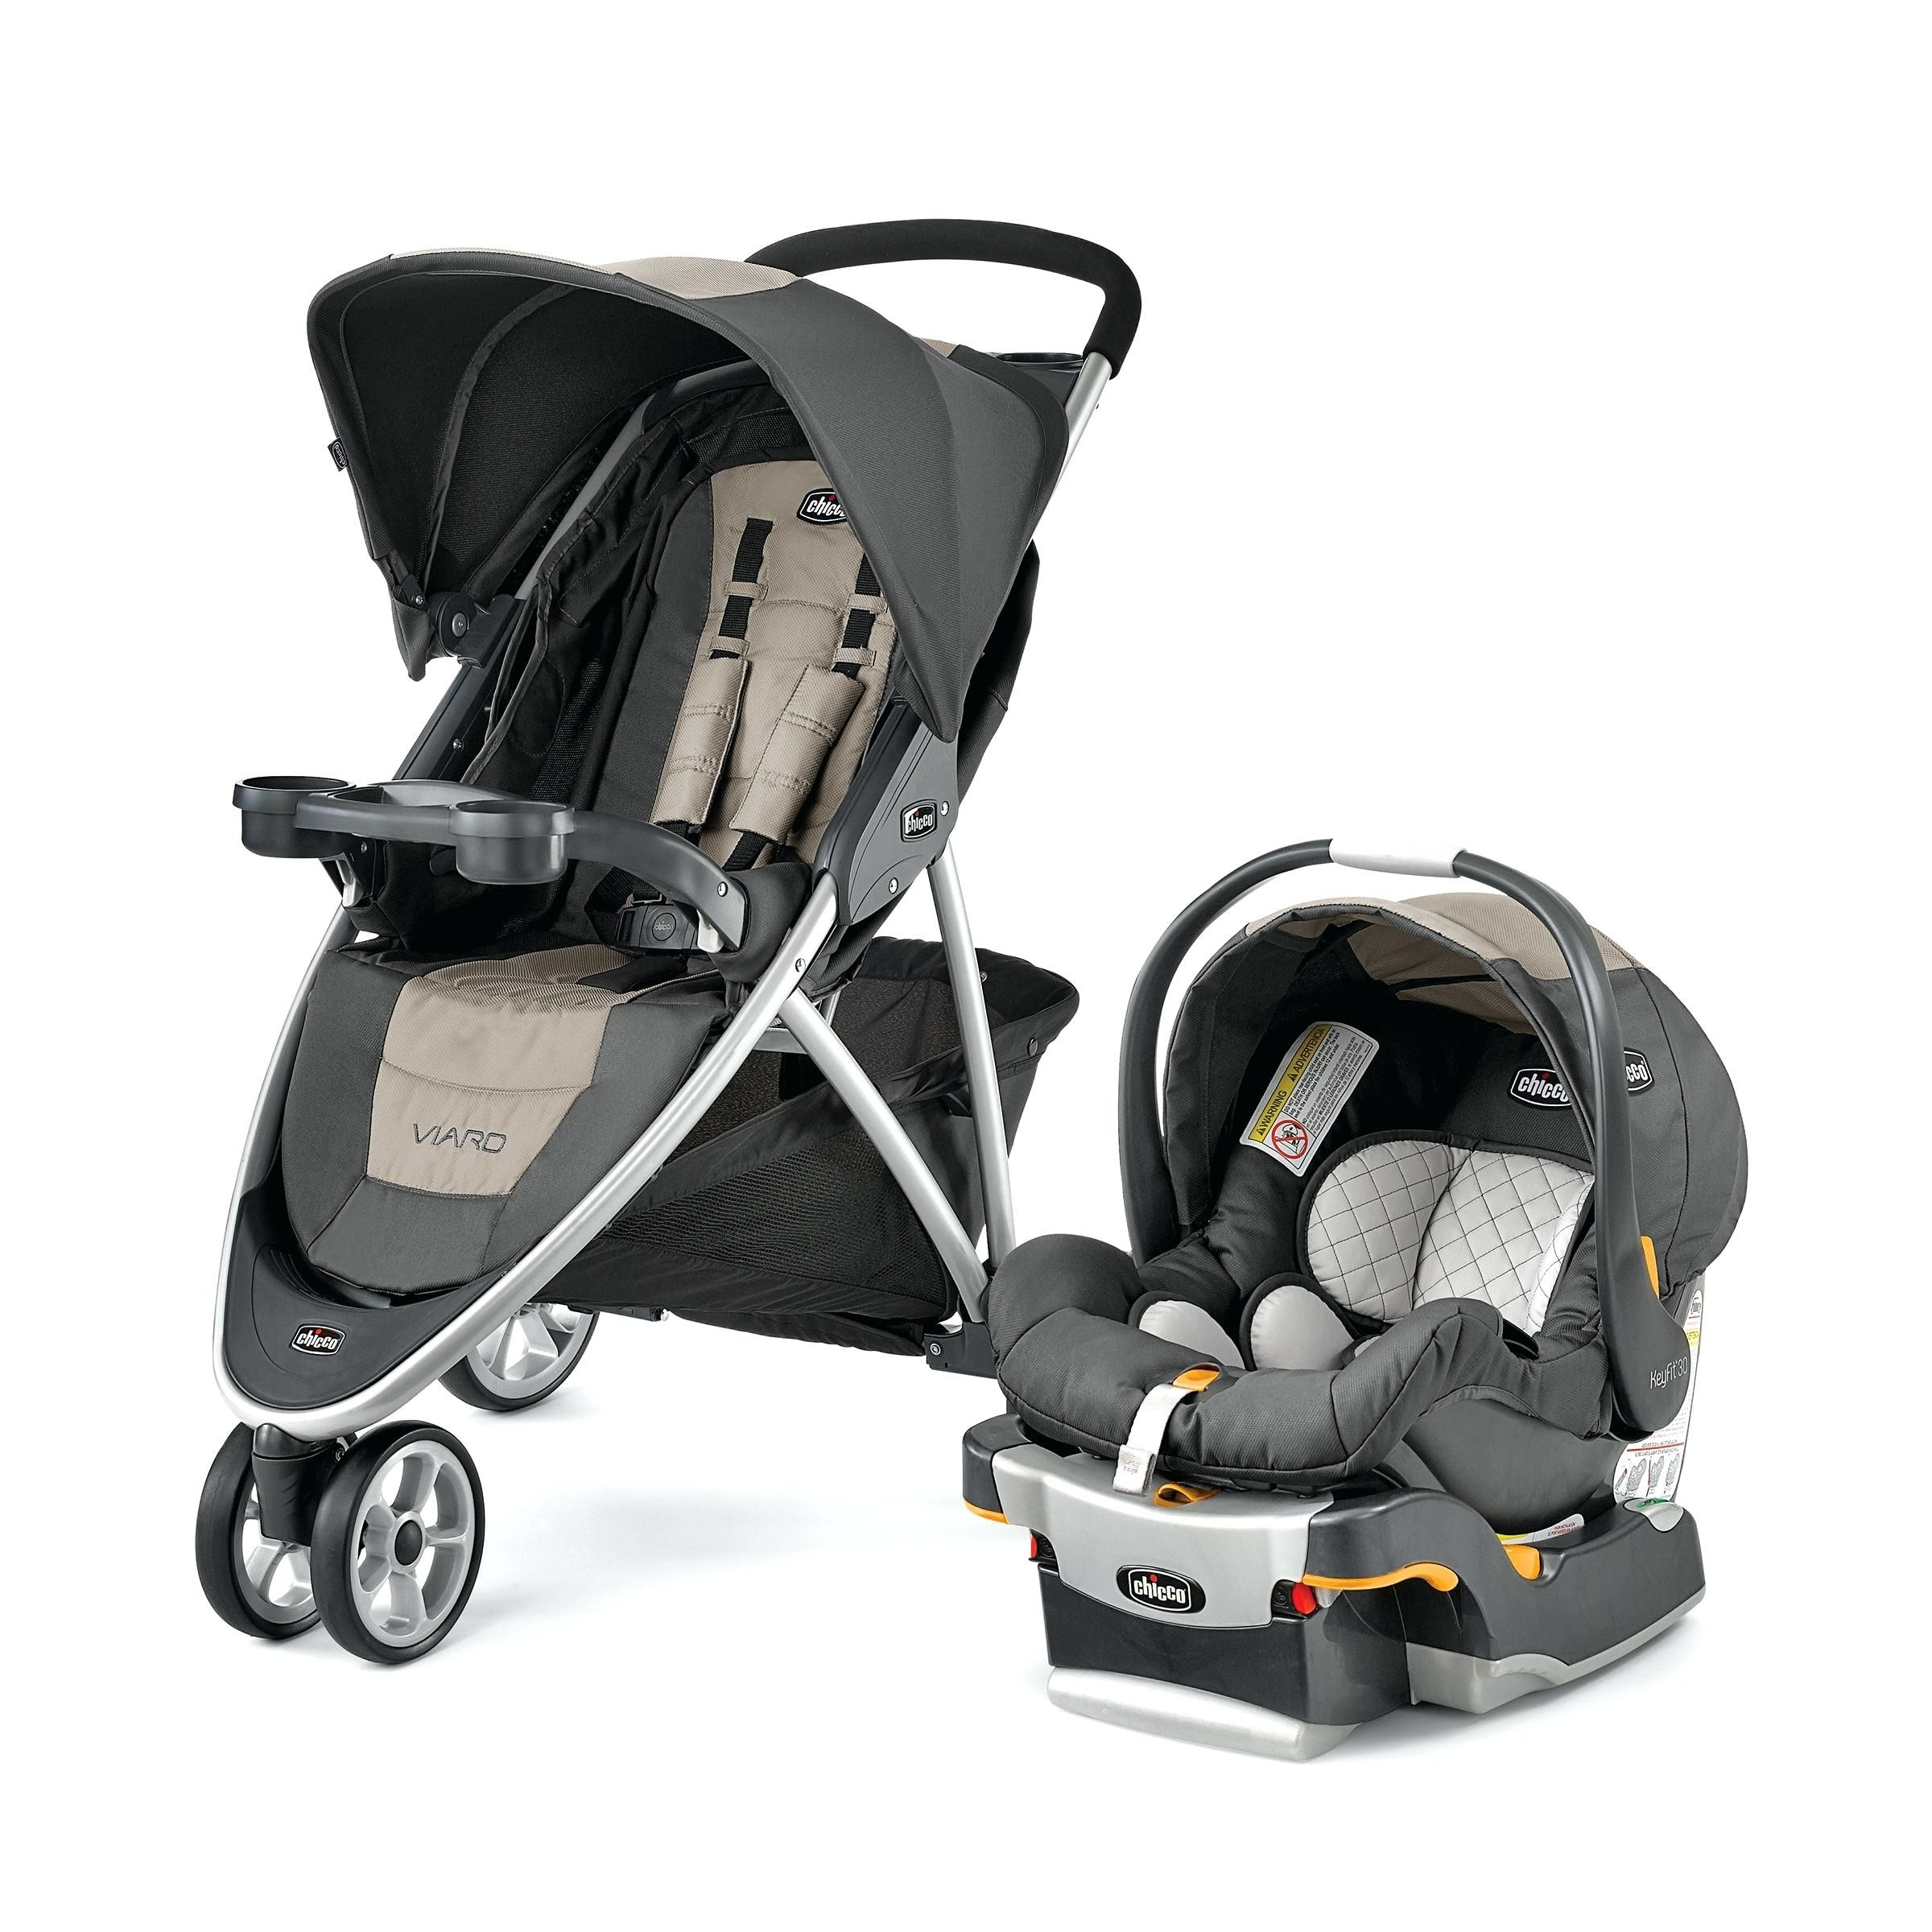 Kinderwagen Kombi Chicco Viaro Kinderwagen Travel System